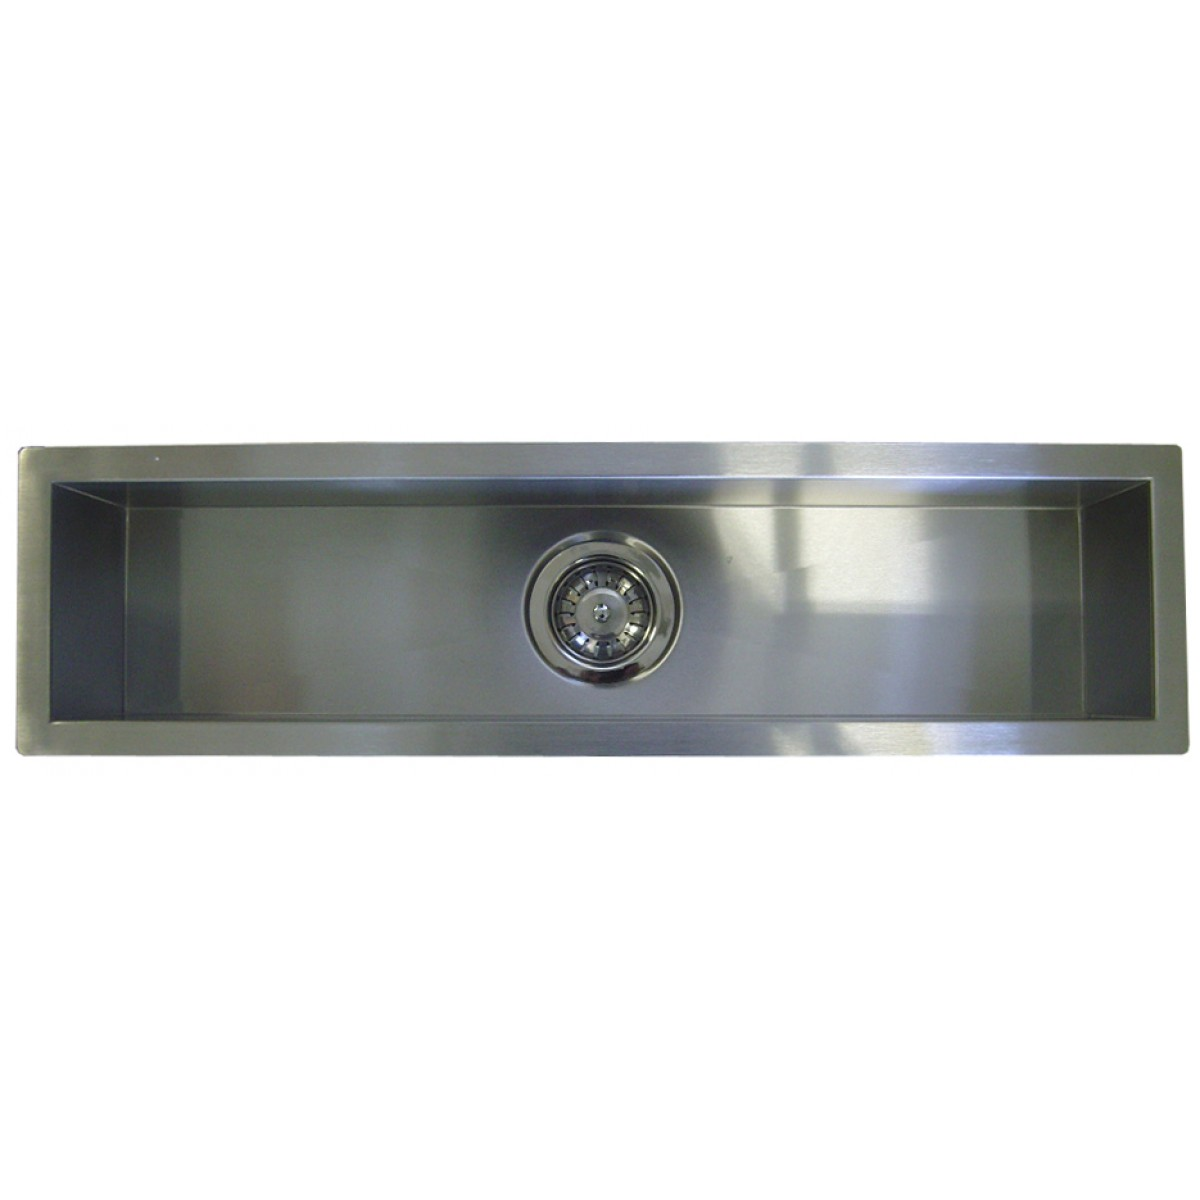 42 Inch Stainless Steel Undermount Single Bowl Kitchen